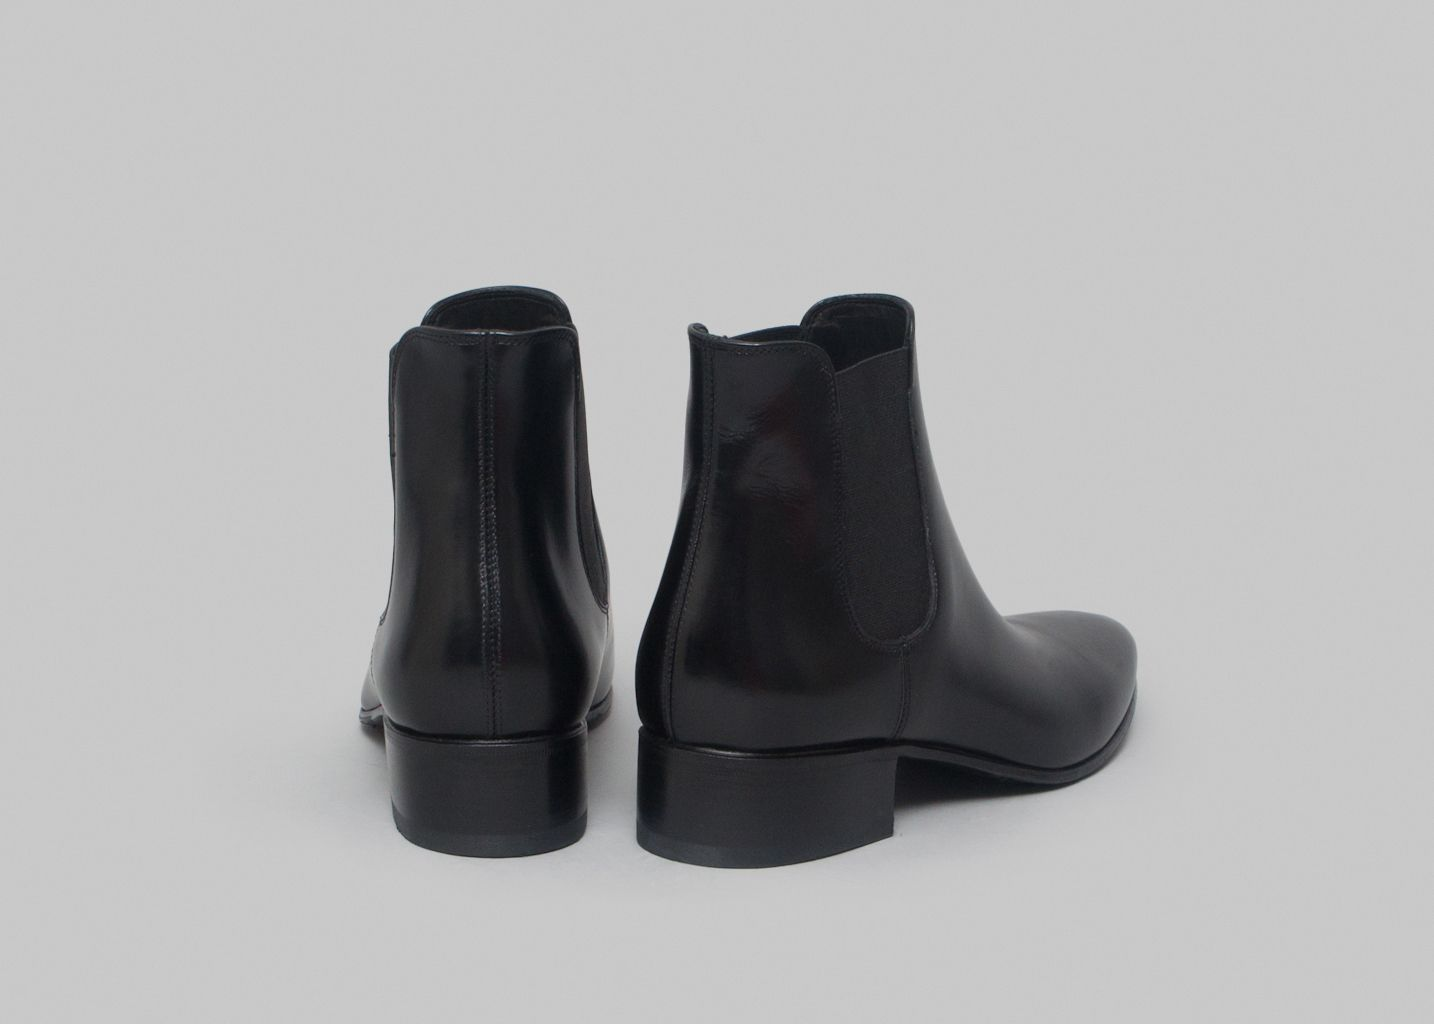 Boots Phantom - Pete Sorensen